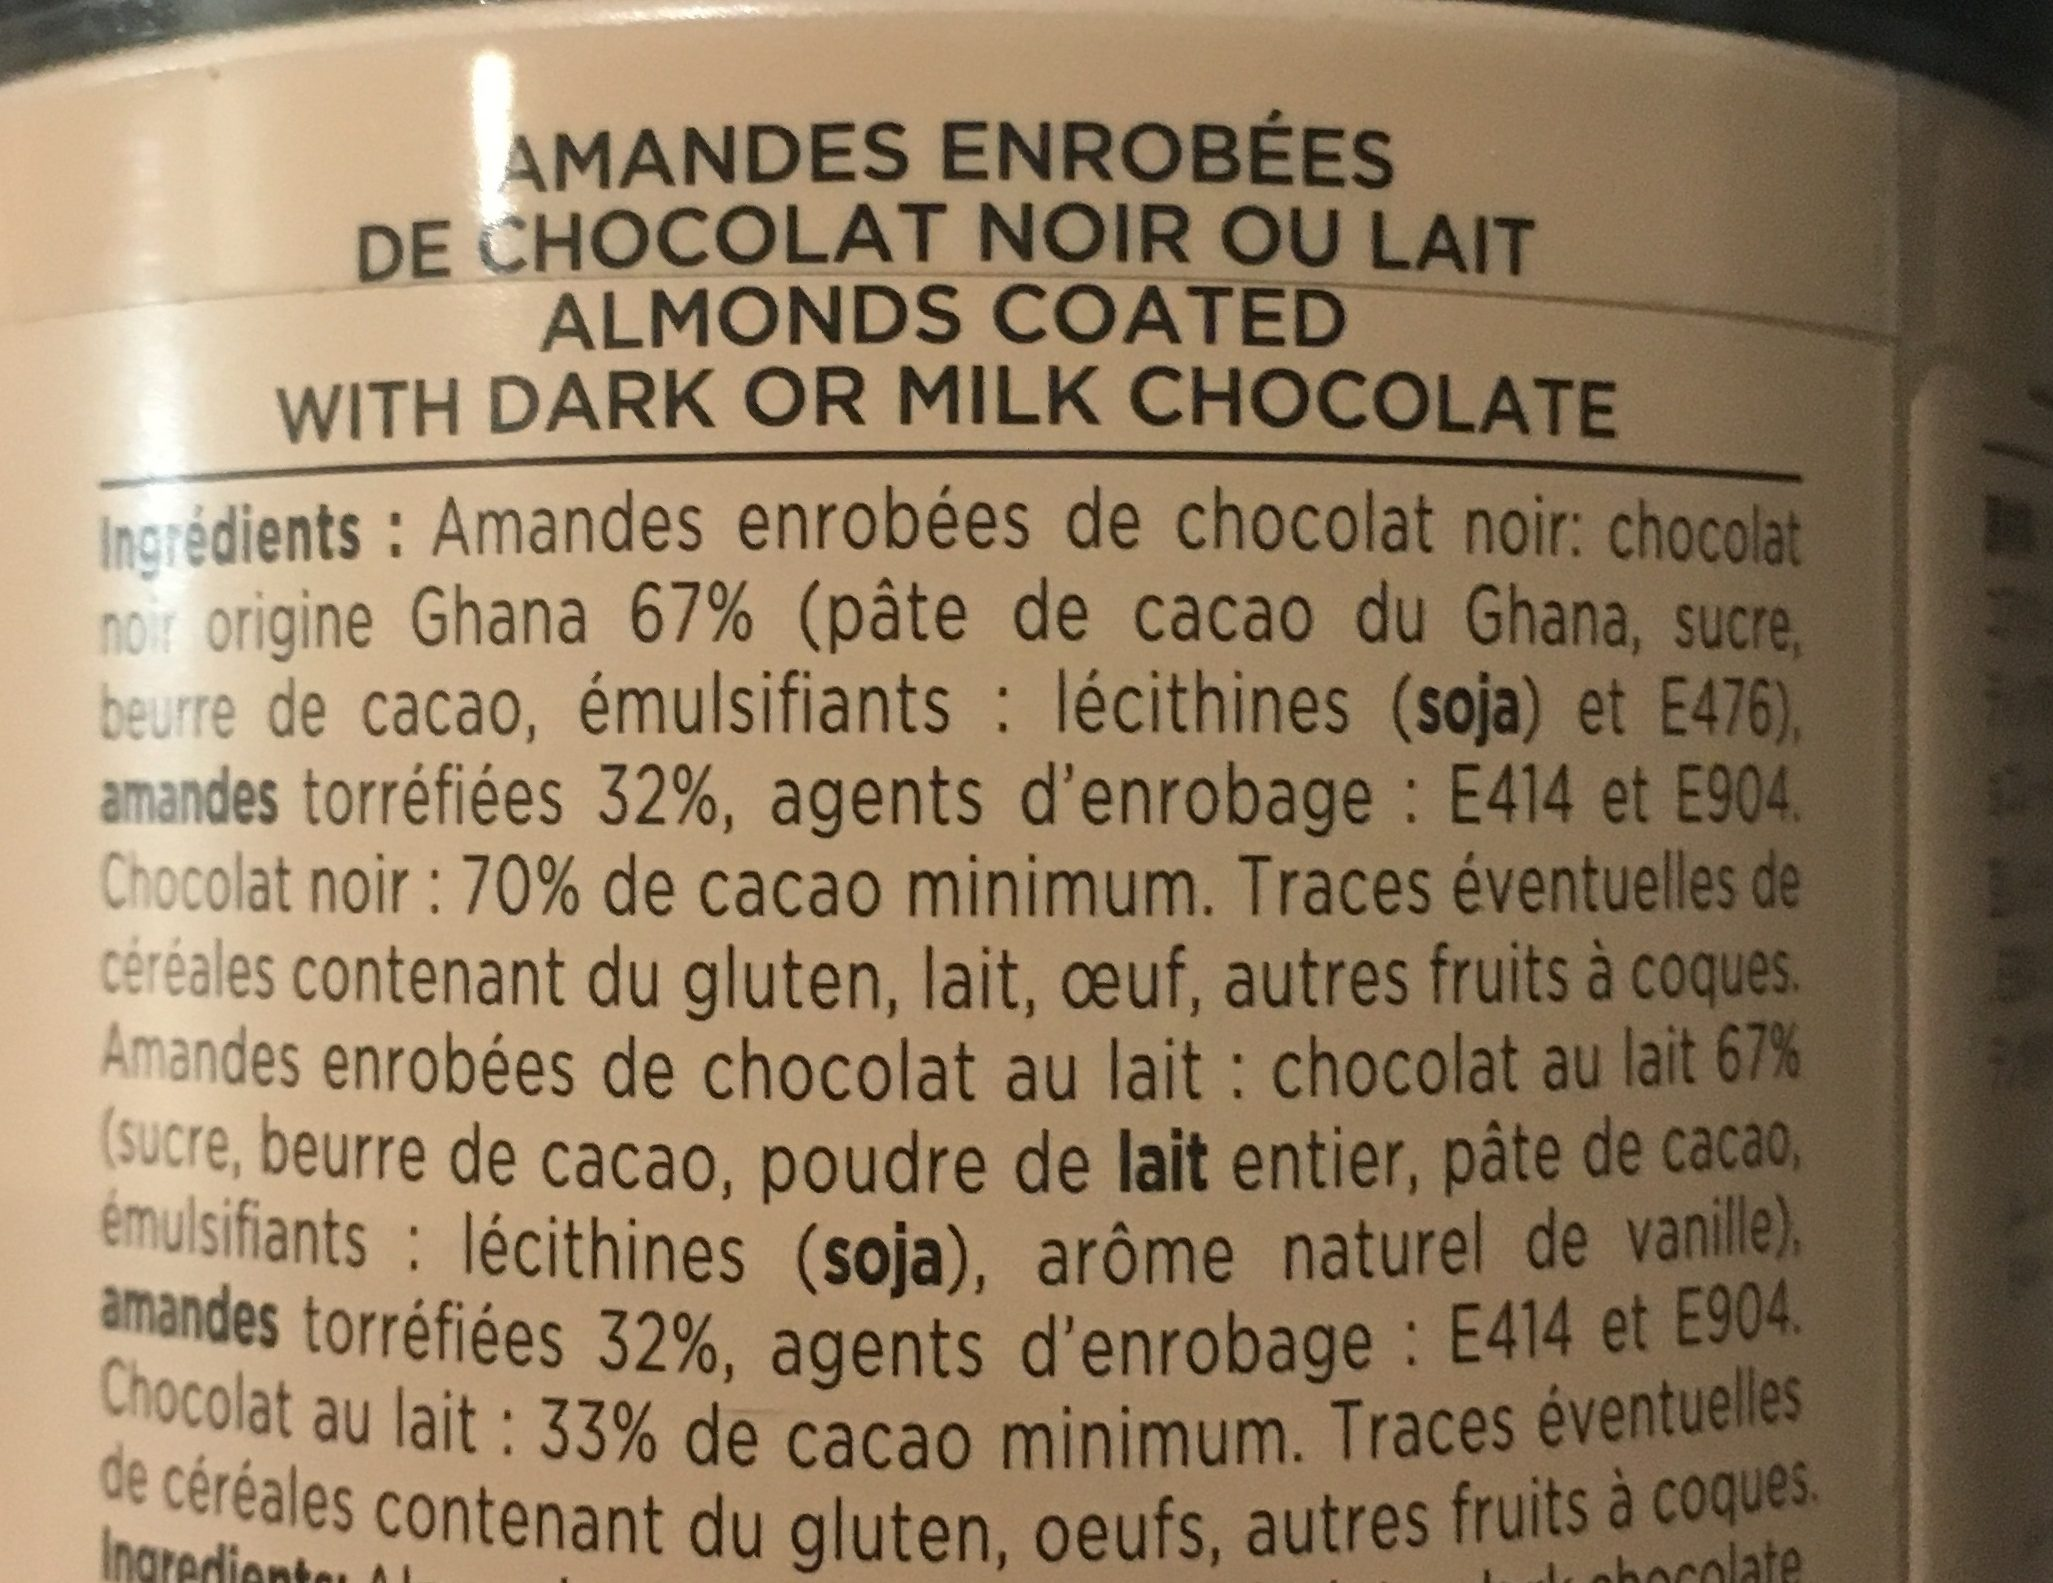 Amandes enrobees de chocolat - Ingrédients - fr